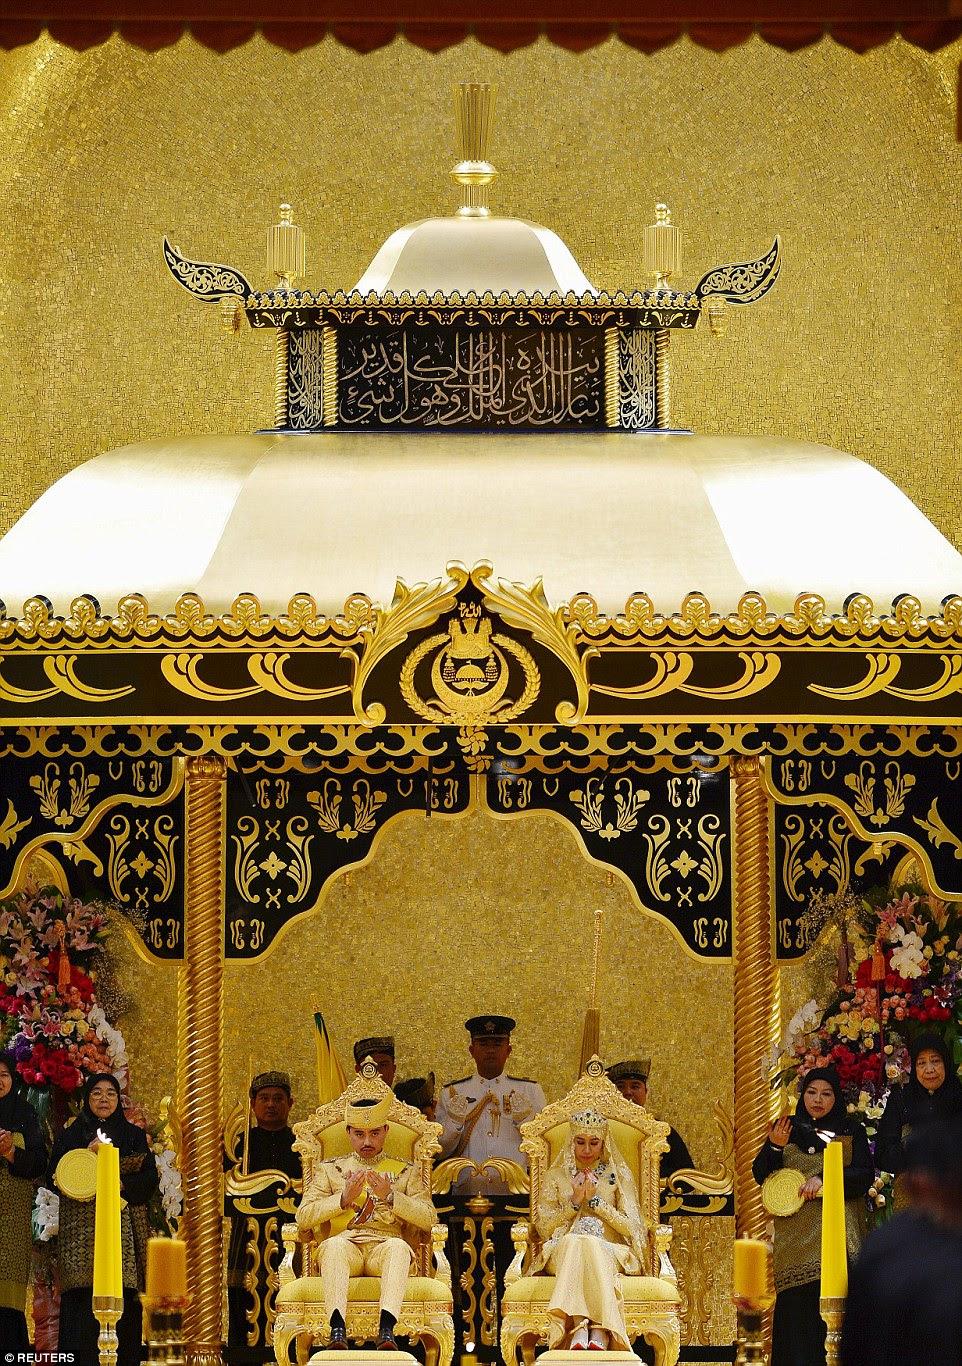 The enthronement ceremony ofPrince Abdul Malik, 31, and Dayangku Raabi'atul 'Adawiyyah Pengiran Haji Bolkiah, 22, took place in the lavish settings of 1,788-room palace, Istana Nural Iman in Brunei